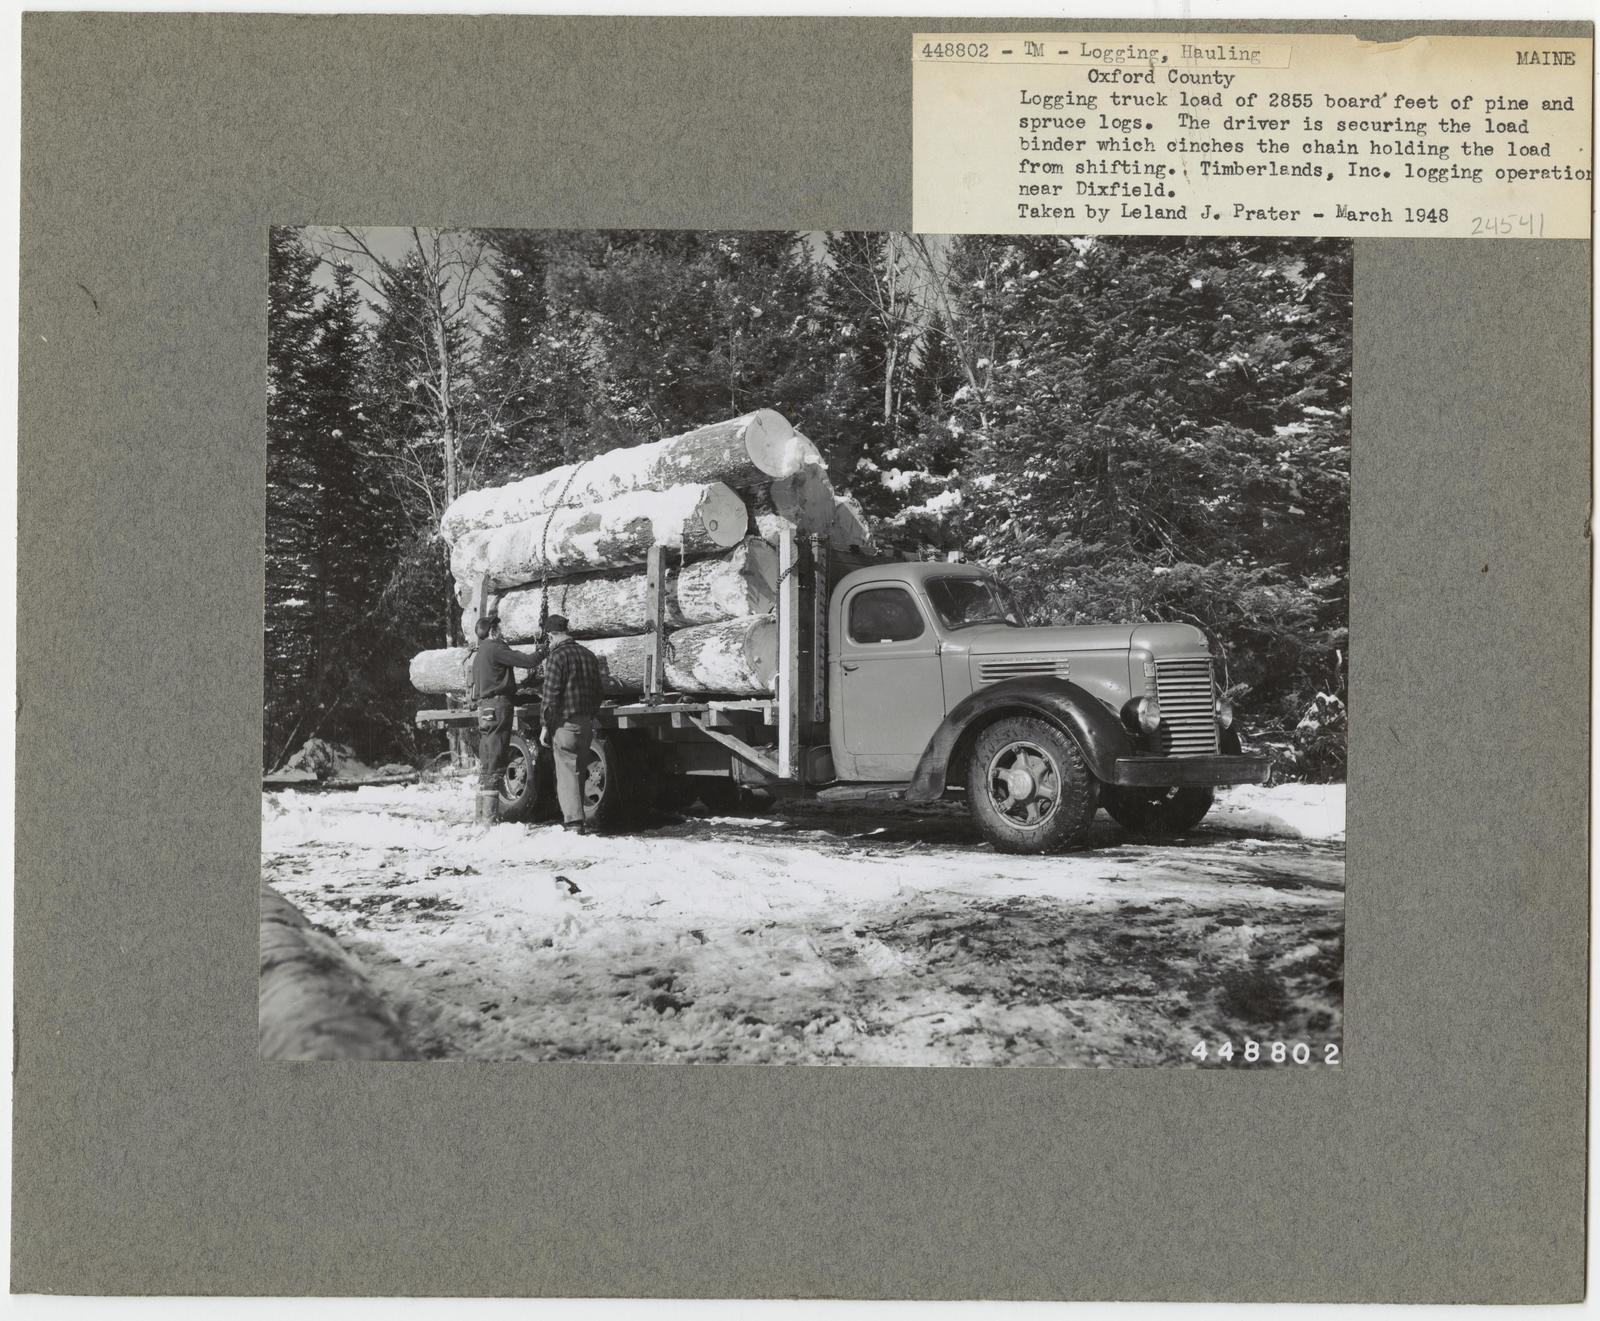 Logging: Transportation: Trucks - Maine